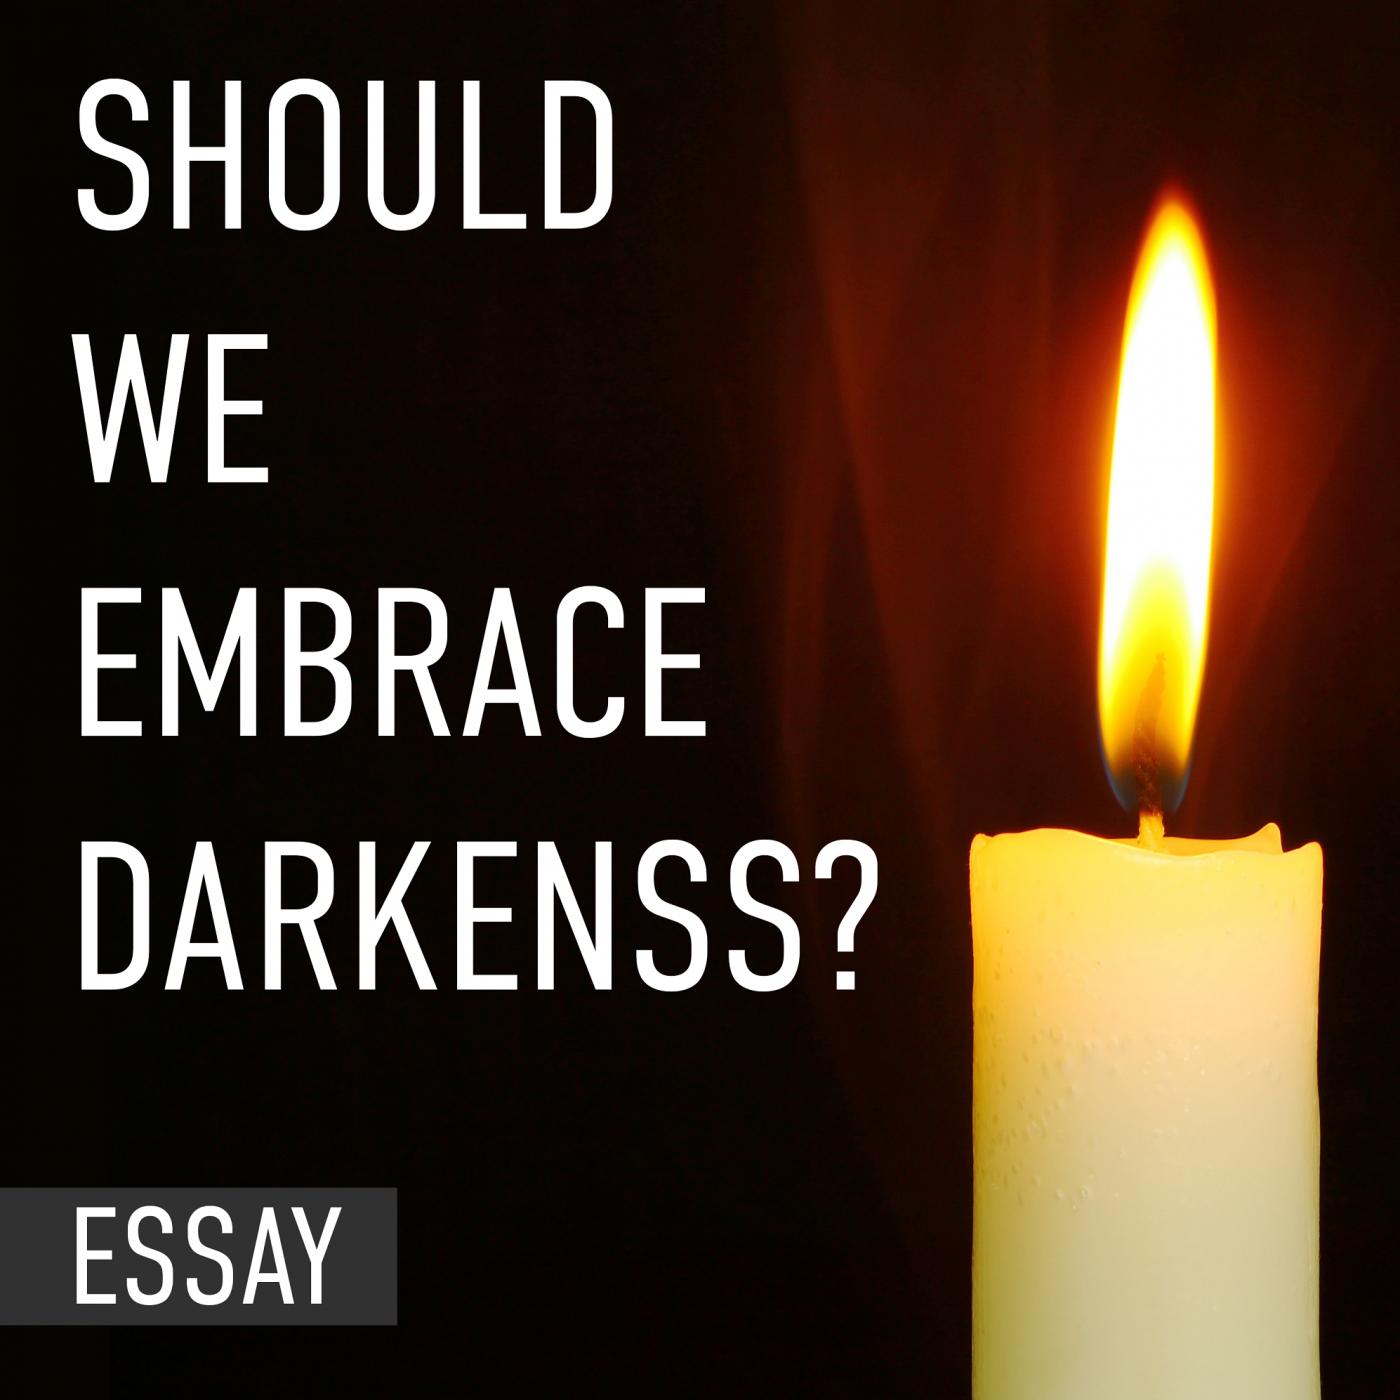 Should we embrace darkness?